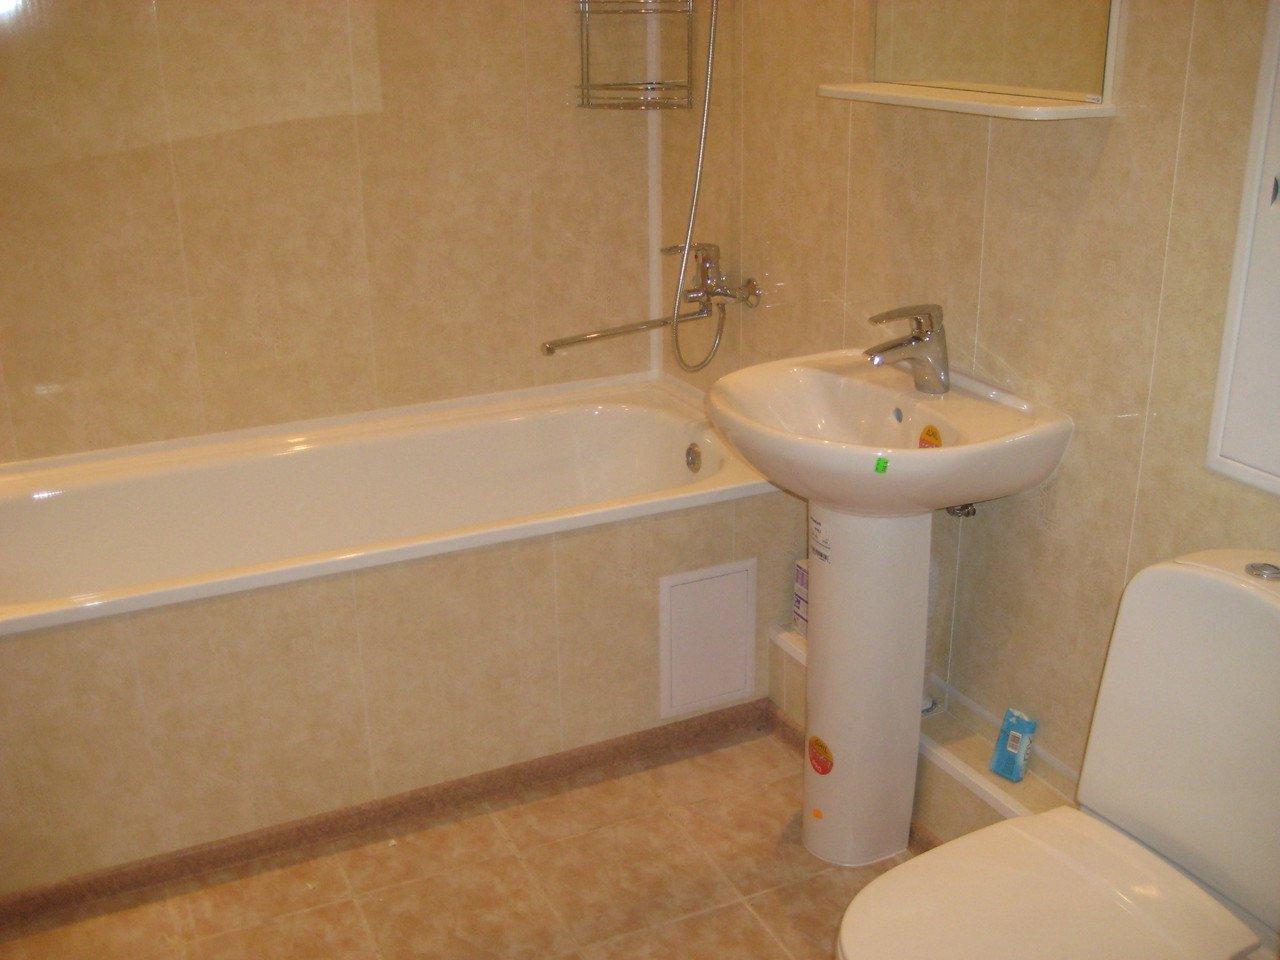 Ванны ремонт панелями